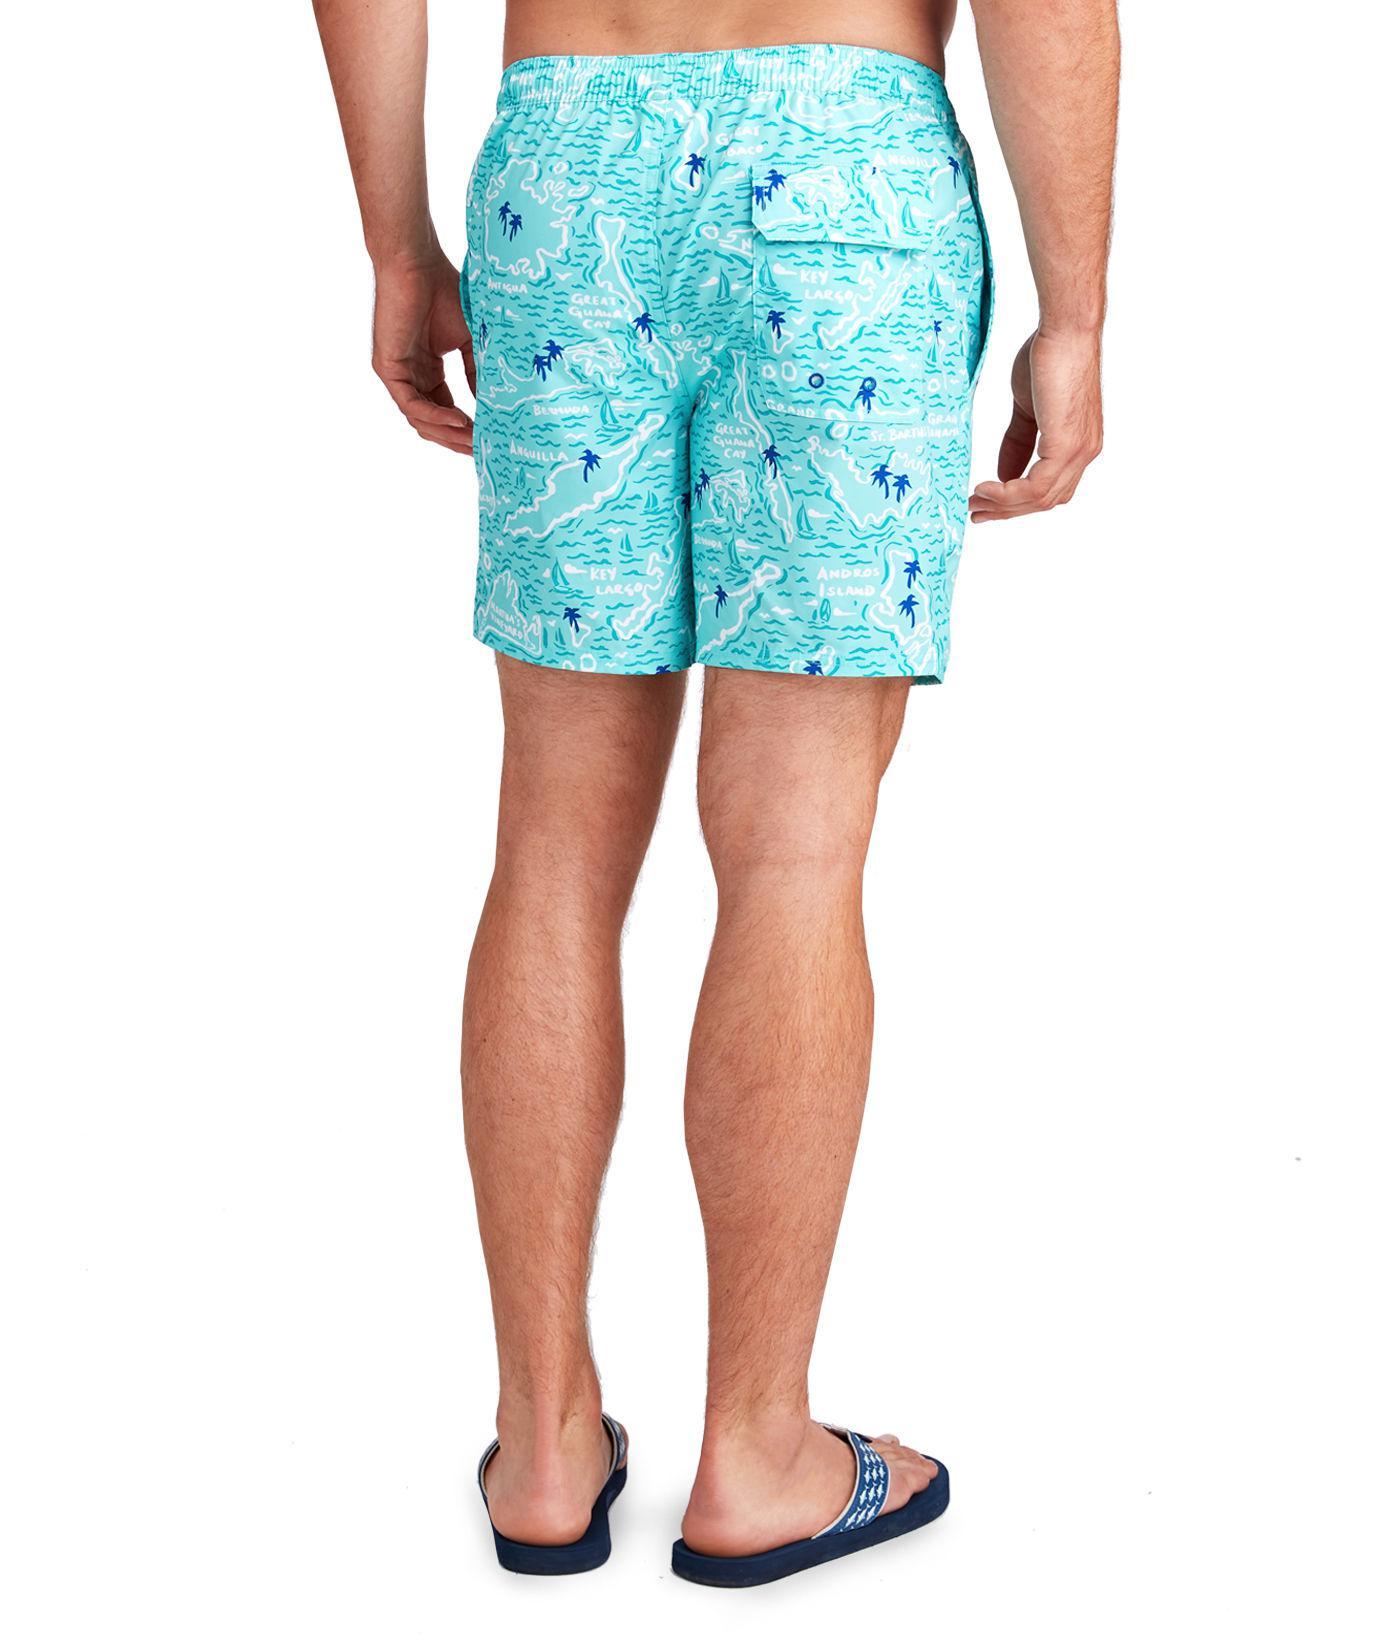 825faa8acb Lyst - Vineyard Vines Chappy Island Map-print Swim Trunks in Blue for Men -  Save 9%